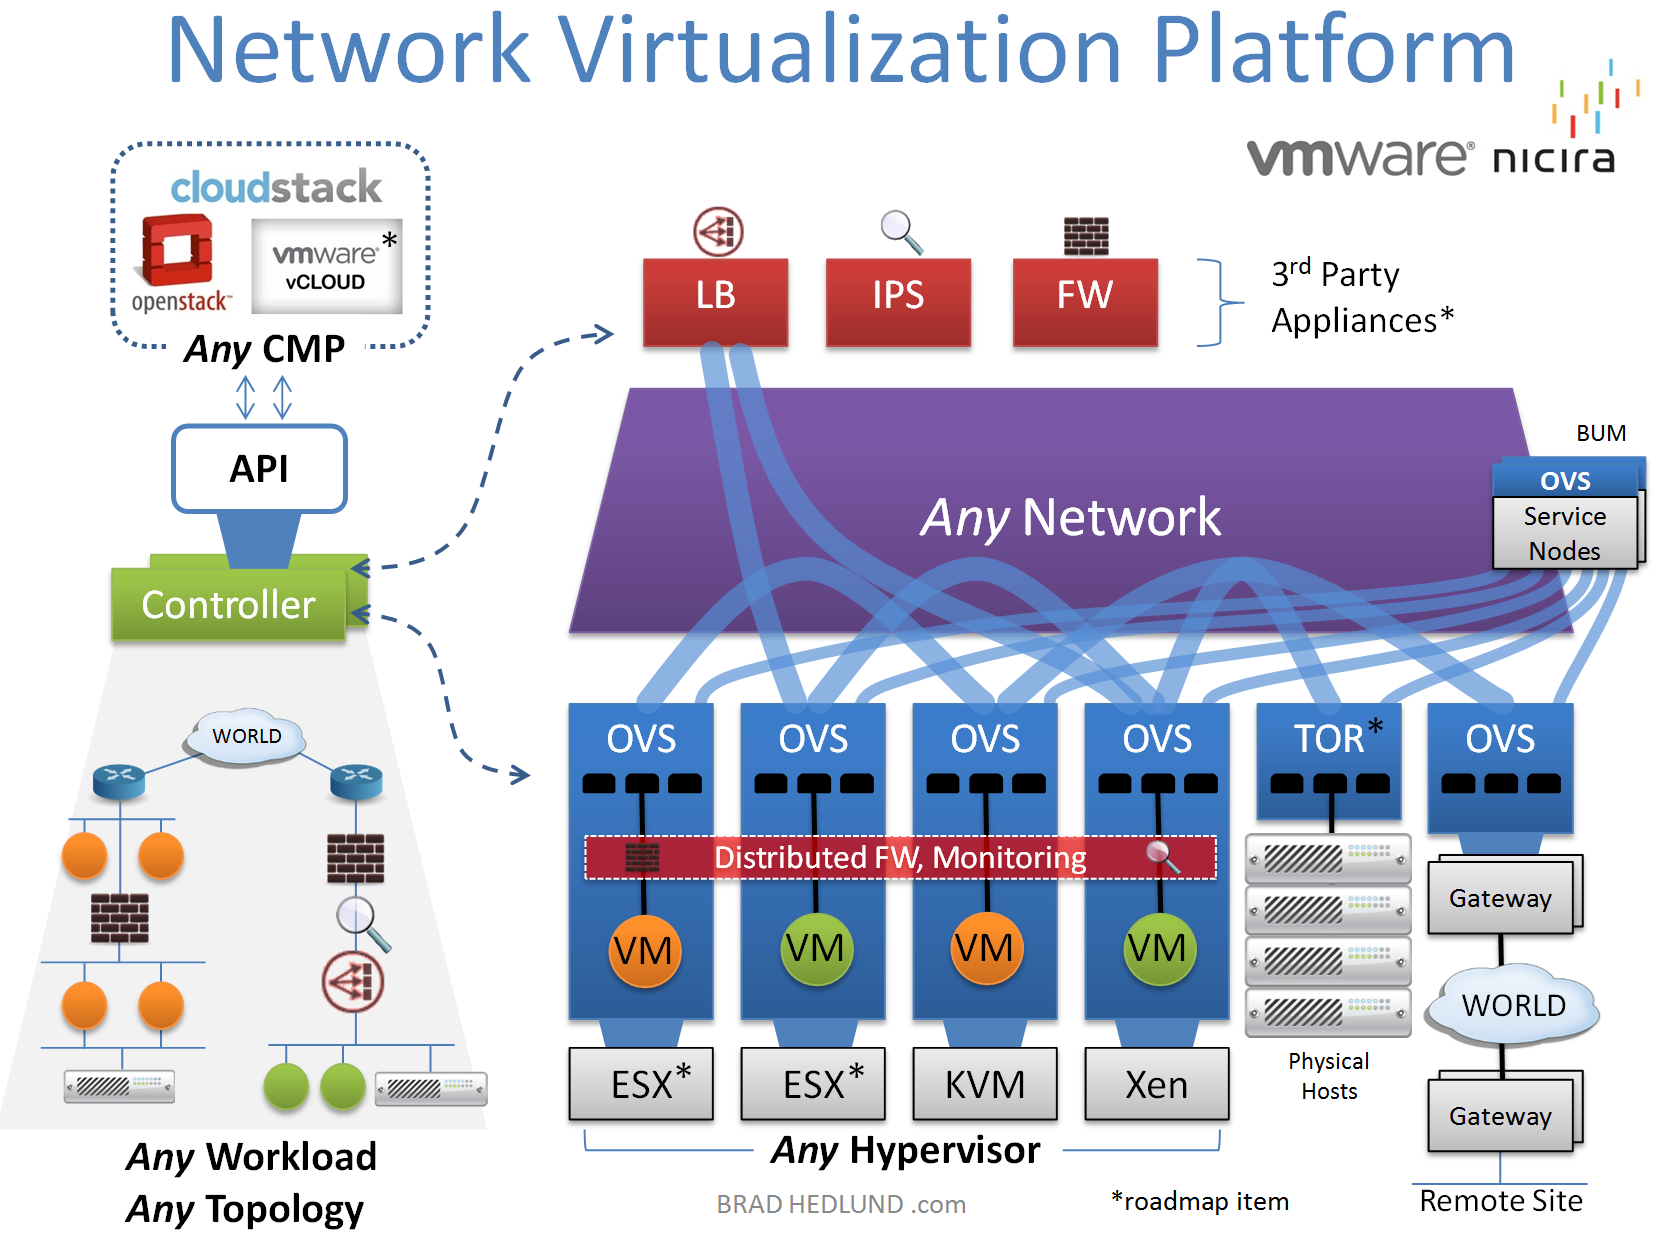 Network Virtualization: a next generation modular platform for the